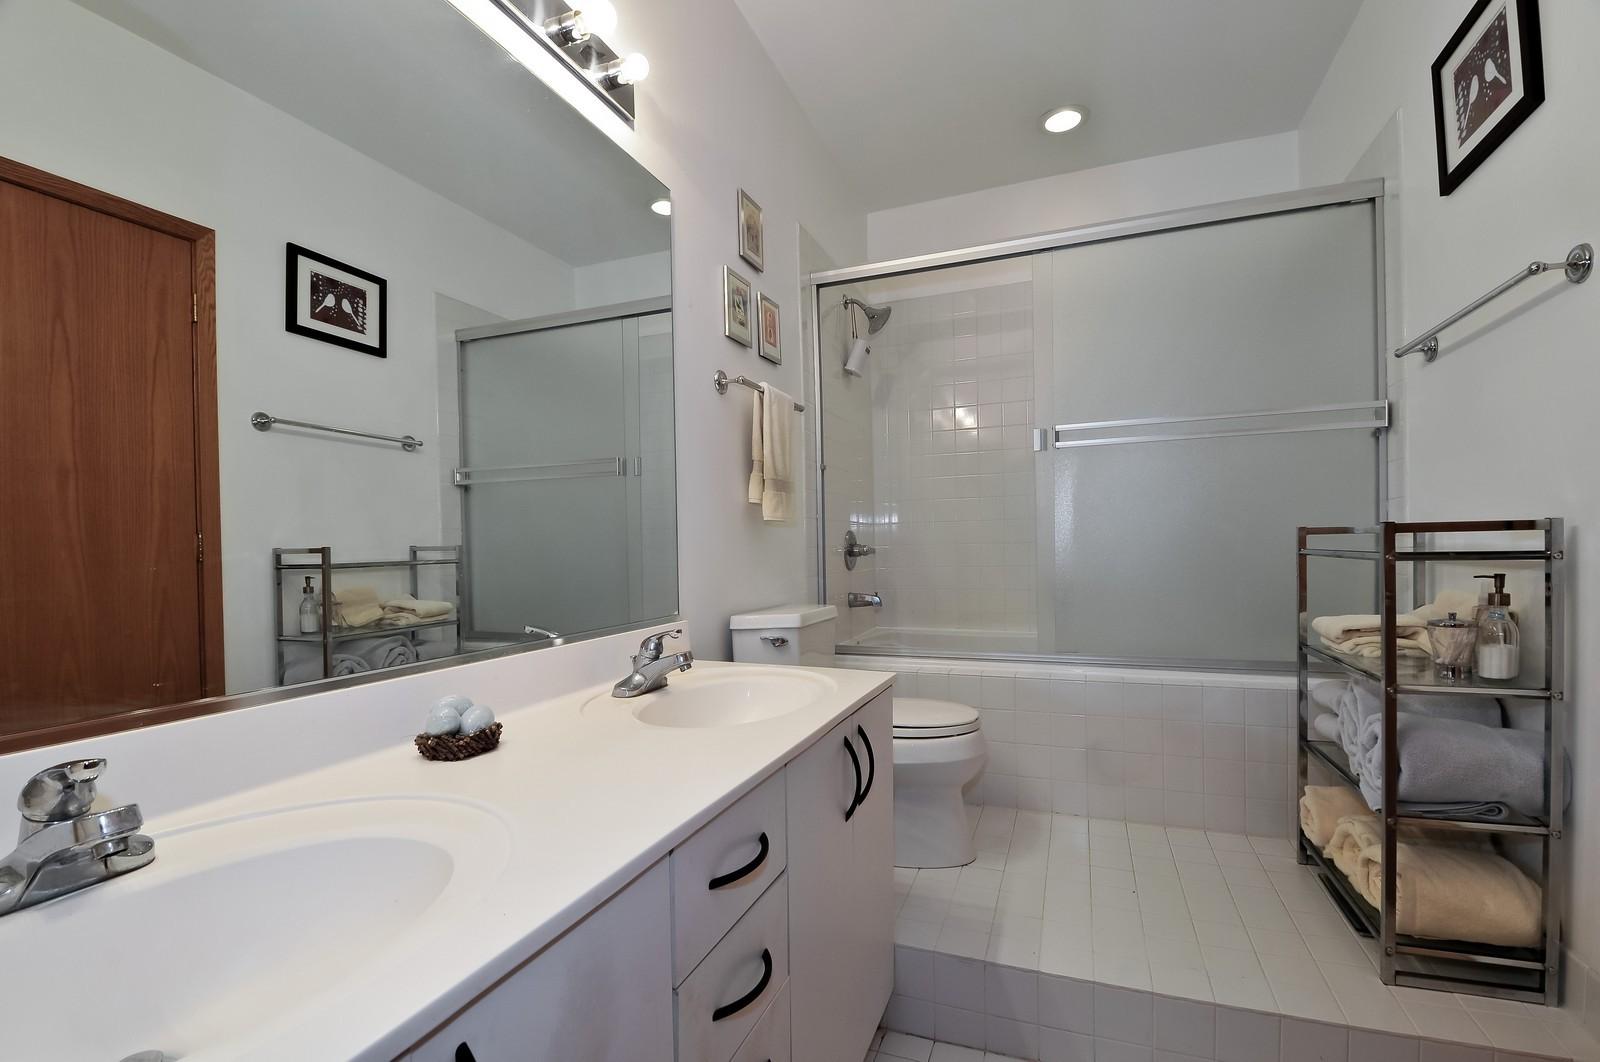 Real Estate Photography - 910 S Michigan, Unit 707, Chicago, IL, 60605 - Bathroom